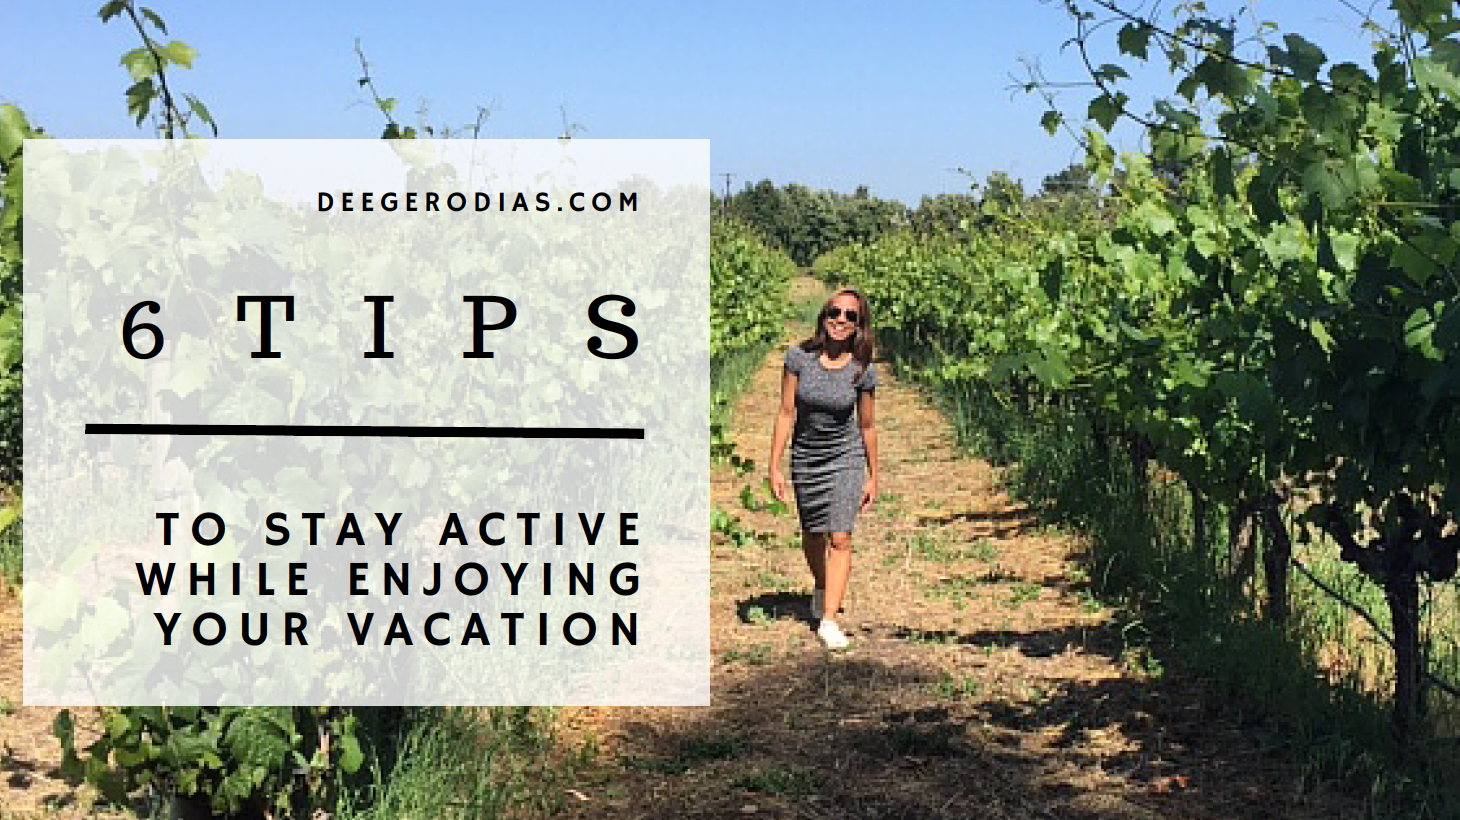 CALIFORNIA: Walked around vineyards in Napa Valley and Sonoma.